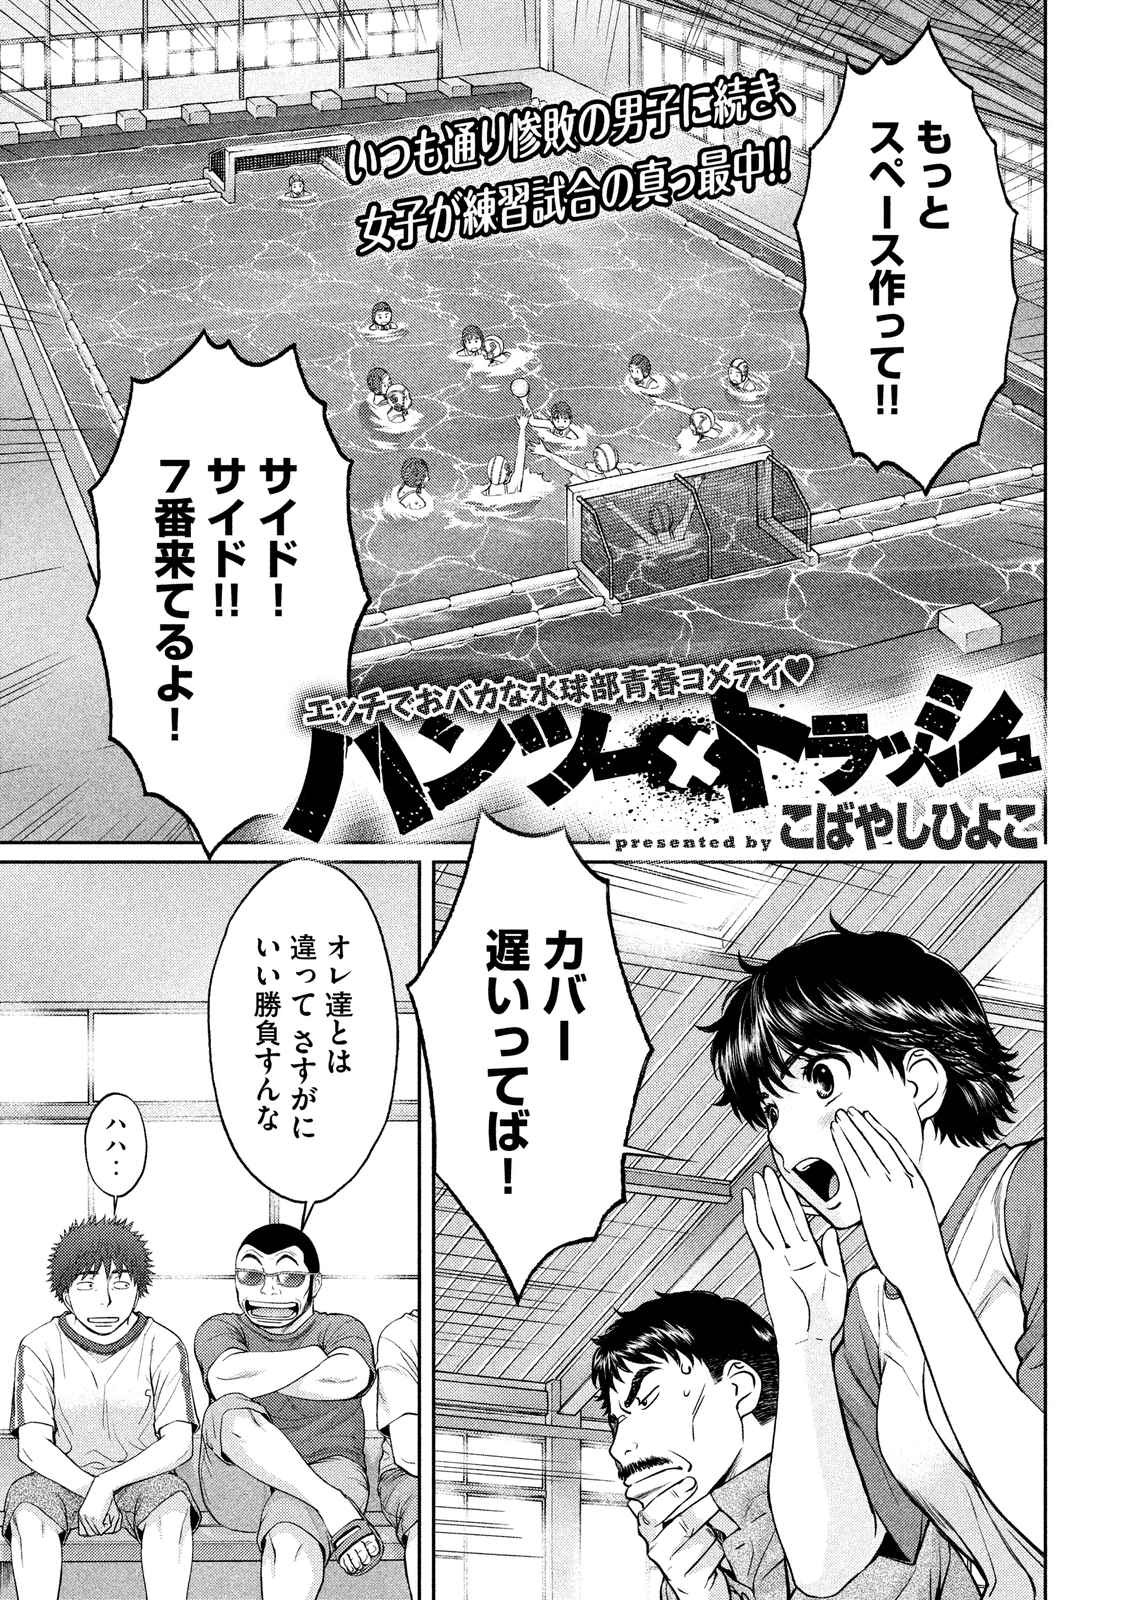 Hantsu x Trash - Chapter 125 - Page 1